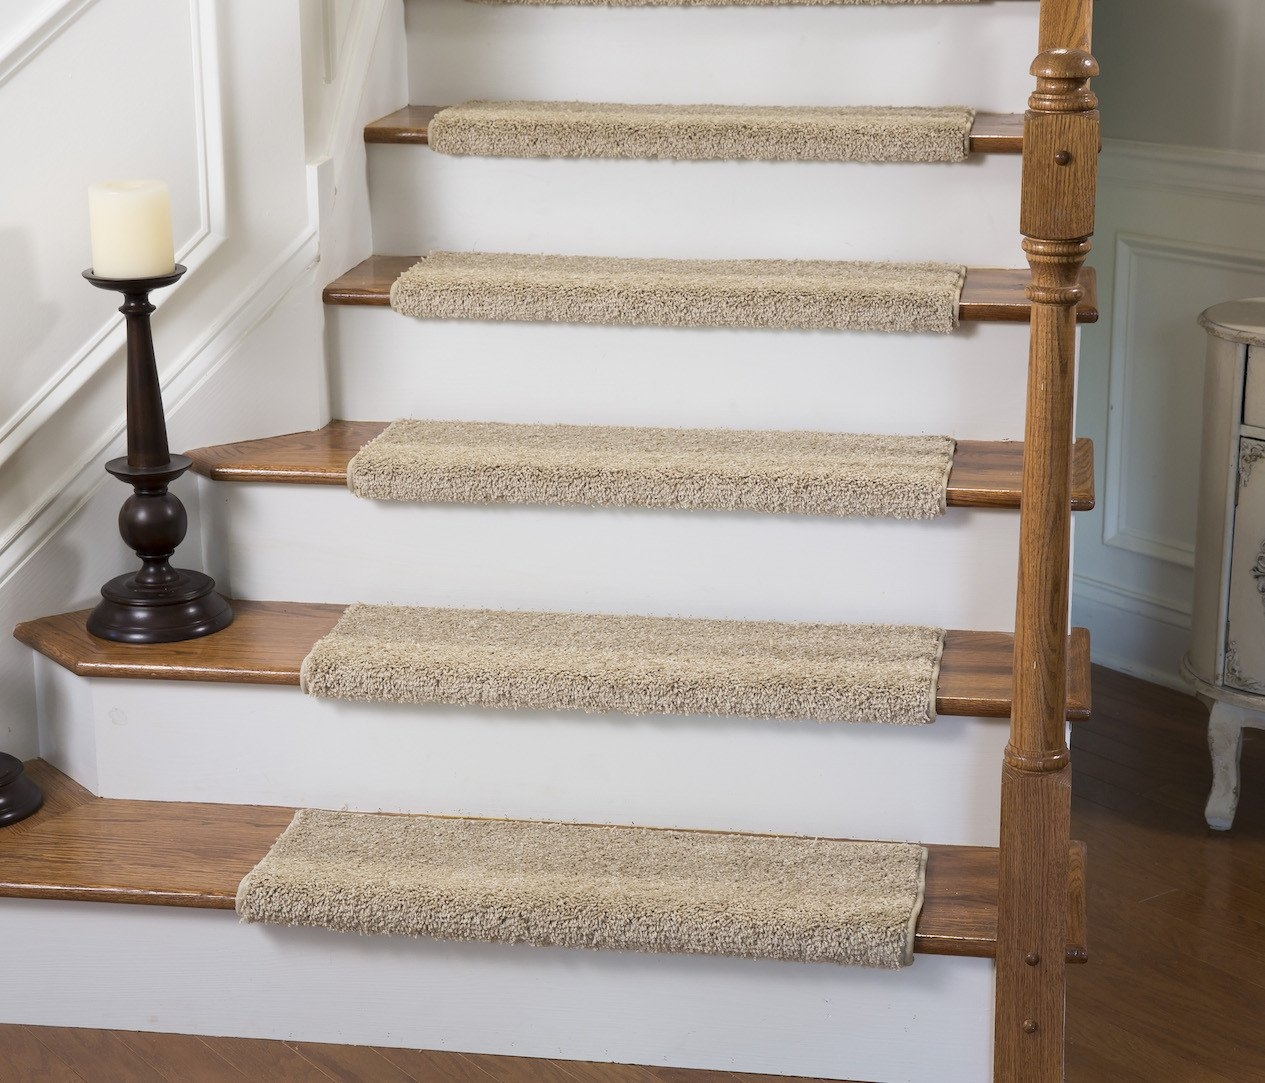 Upc 649070000130 Caprice Almond Bullnose Carpet Stair Tread With   Carpet Stair Treads Walmart   Beige Carpet   Risers   Stair Runner   Tread Rugs   Skid Resistant